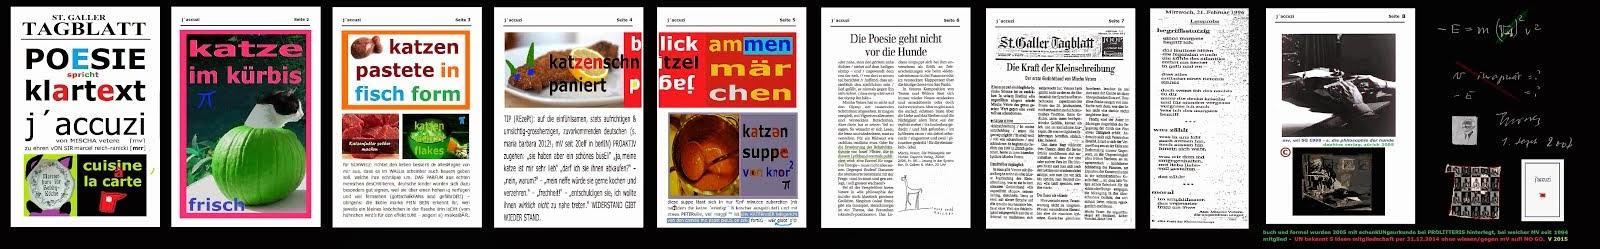 navi pillay censorship by germans deutsche telekom bnd merkel gauck against mischa vetere